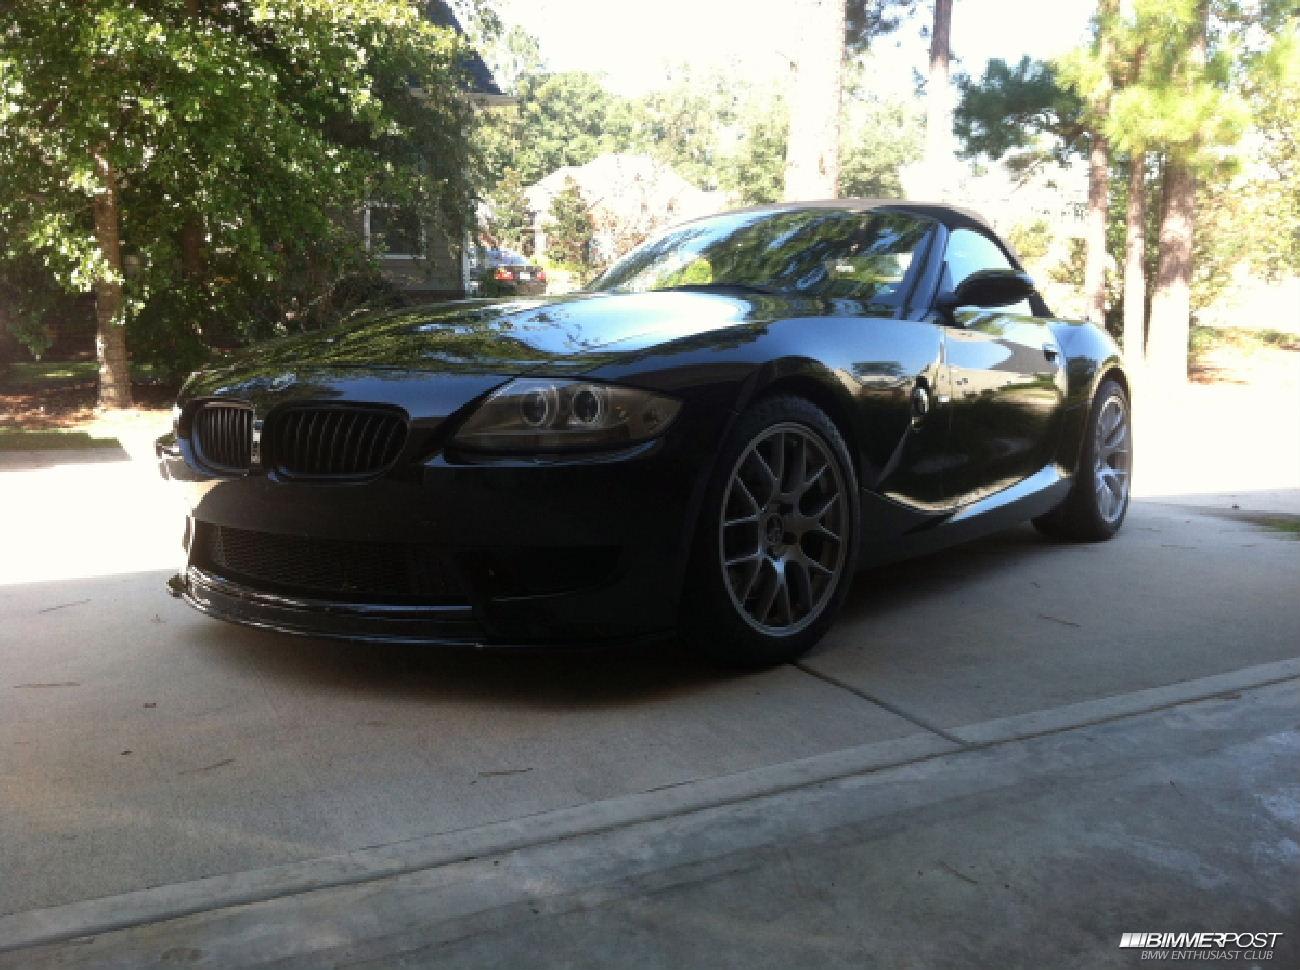 All BMW Models blacked out bmw x3 STIHLBOLTS's 2008 Z4 M Roadster - BIMMERPOST Garage